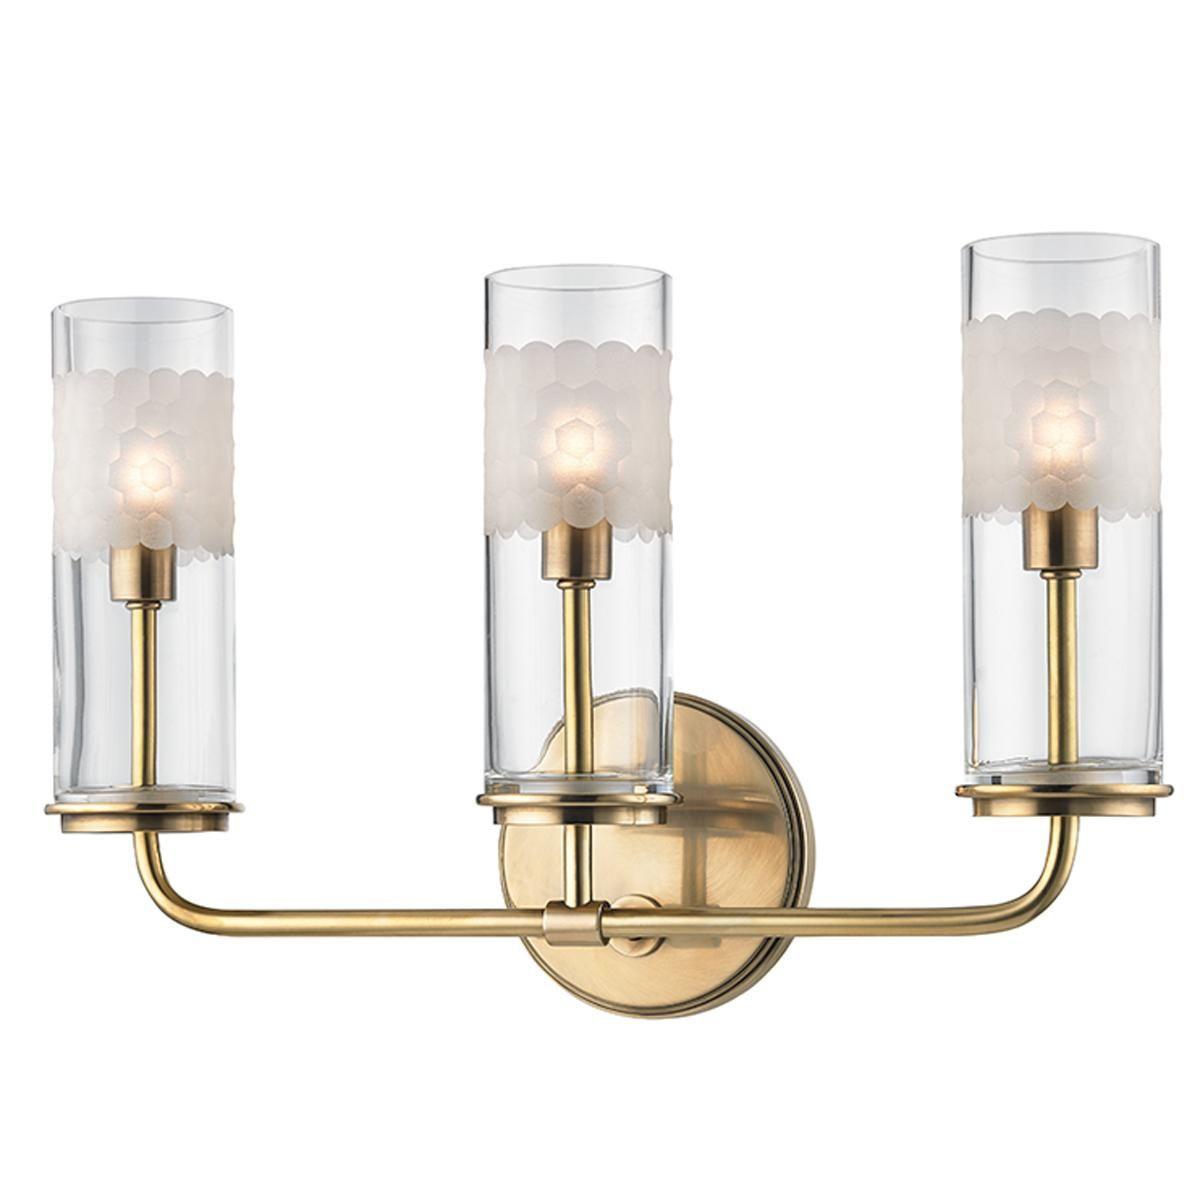 Brass Bathroom Lighting Hudson Valley Unowinc Gymax Orlando Vintage Wire Cage Retro Sconce Wall Light